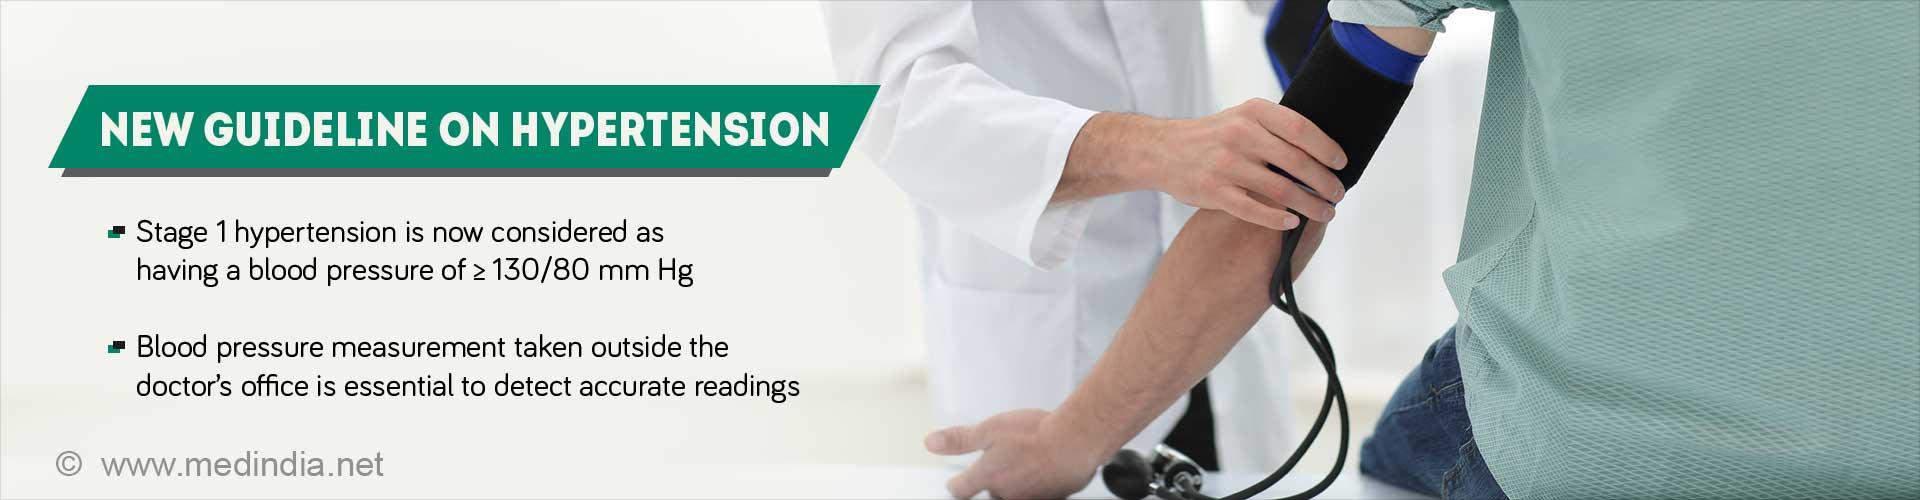 High Blood Pressure Guideline Lower Definition of Hypertension